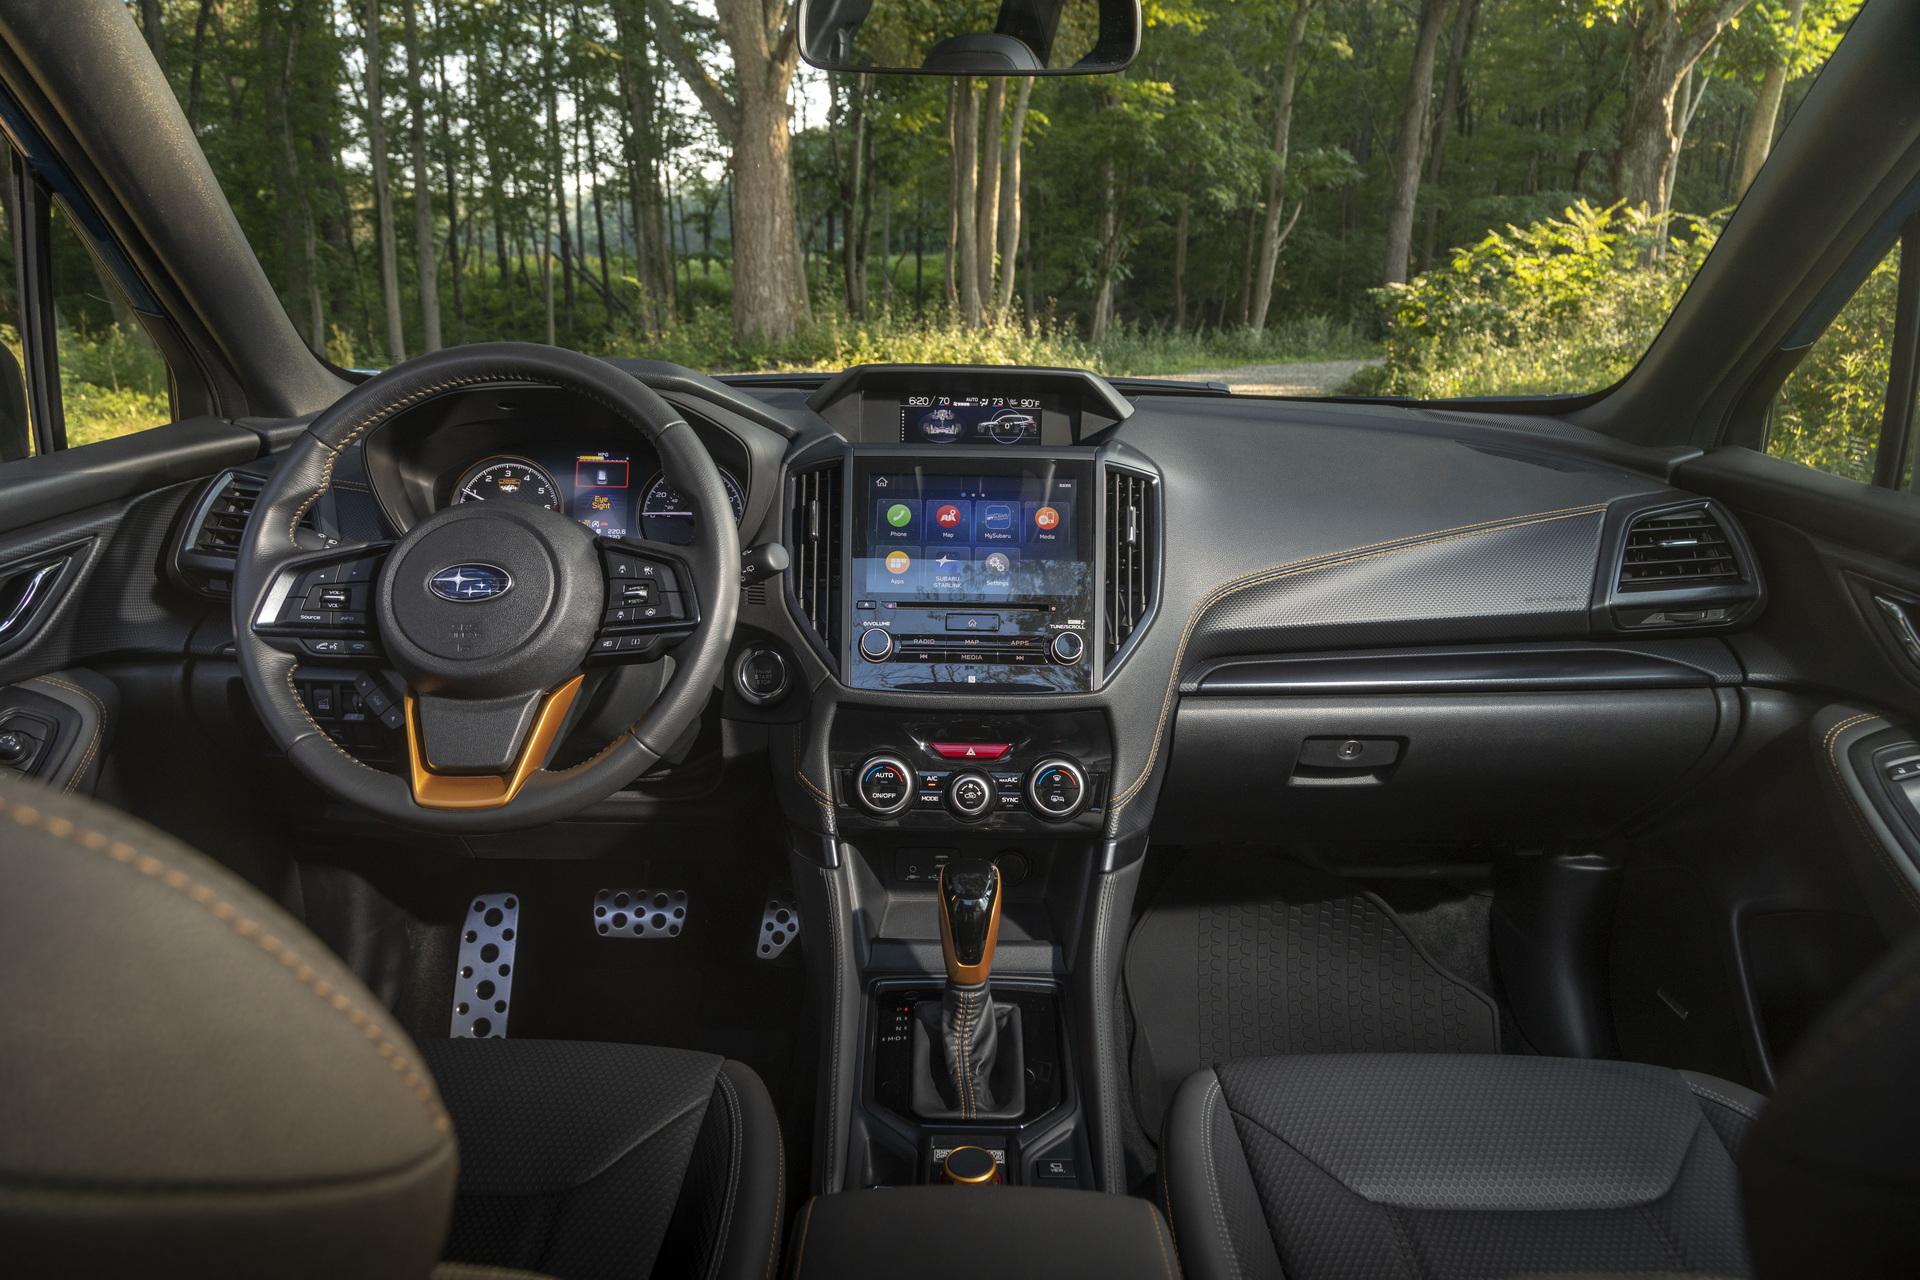 Subaru Forester 2022 ra mắt, bổ sung thêm phiên bản Wilderness mới 2022-subaru-forester-wilderness-7.jpg